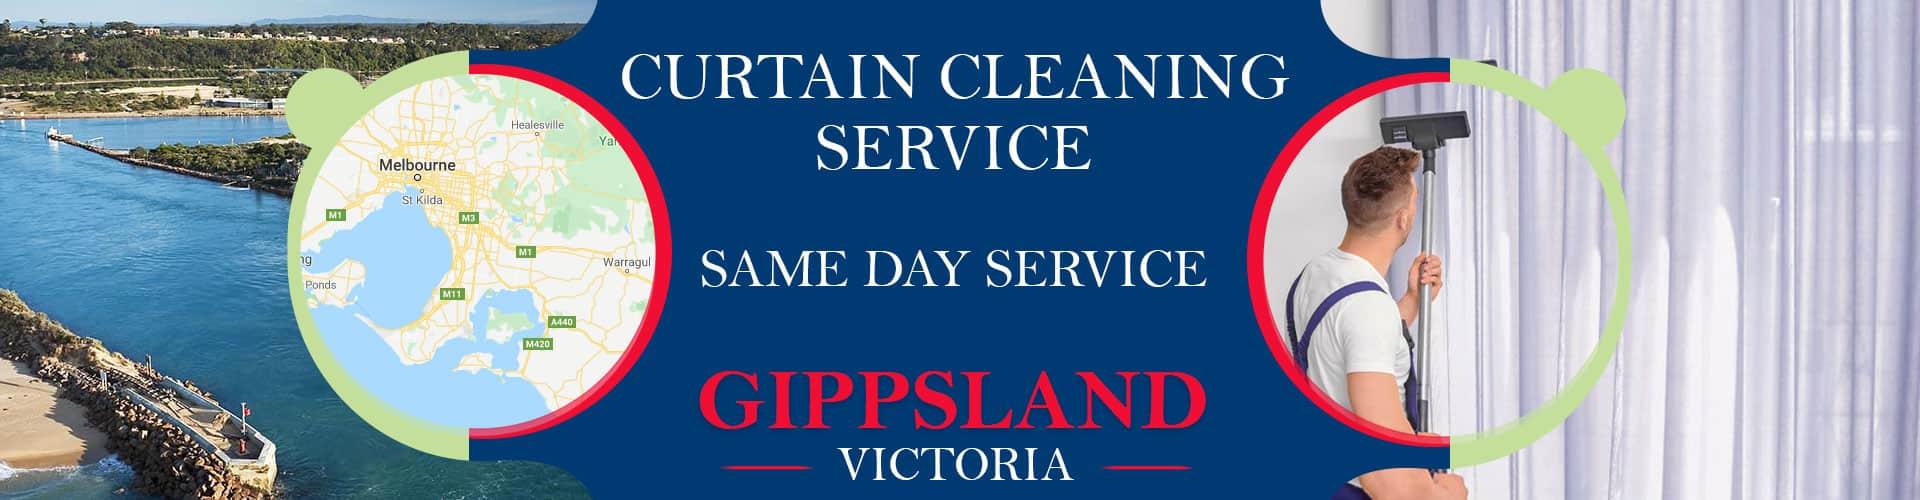 Curtain Cleaning Gippsland